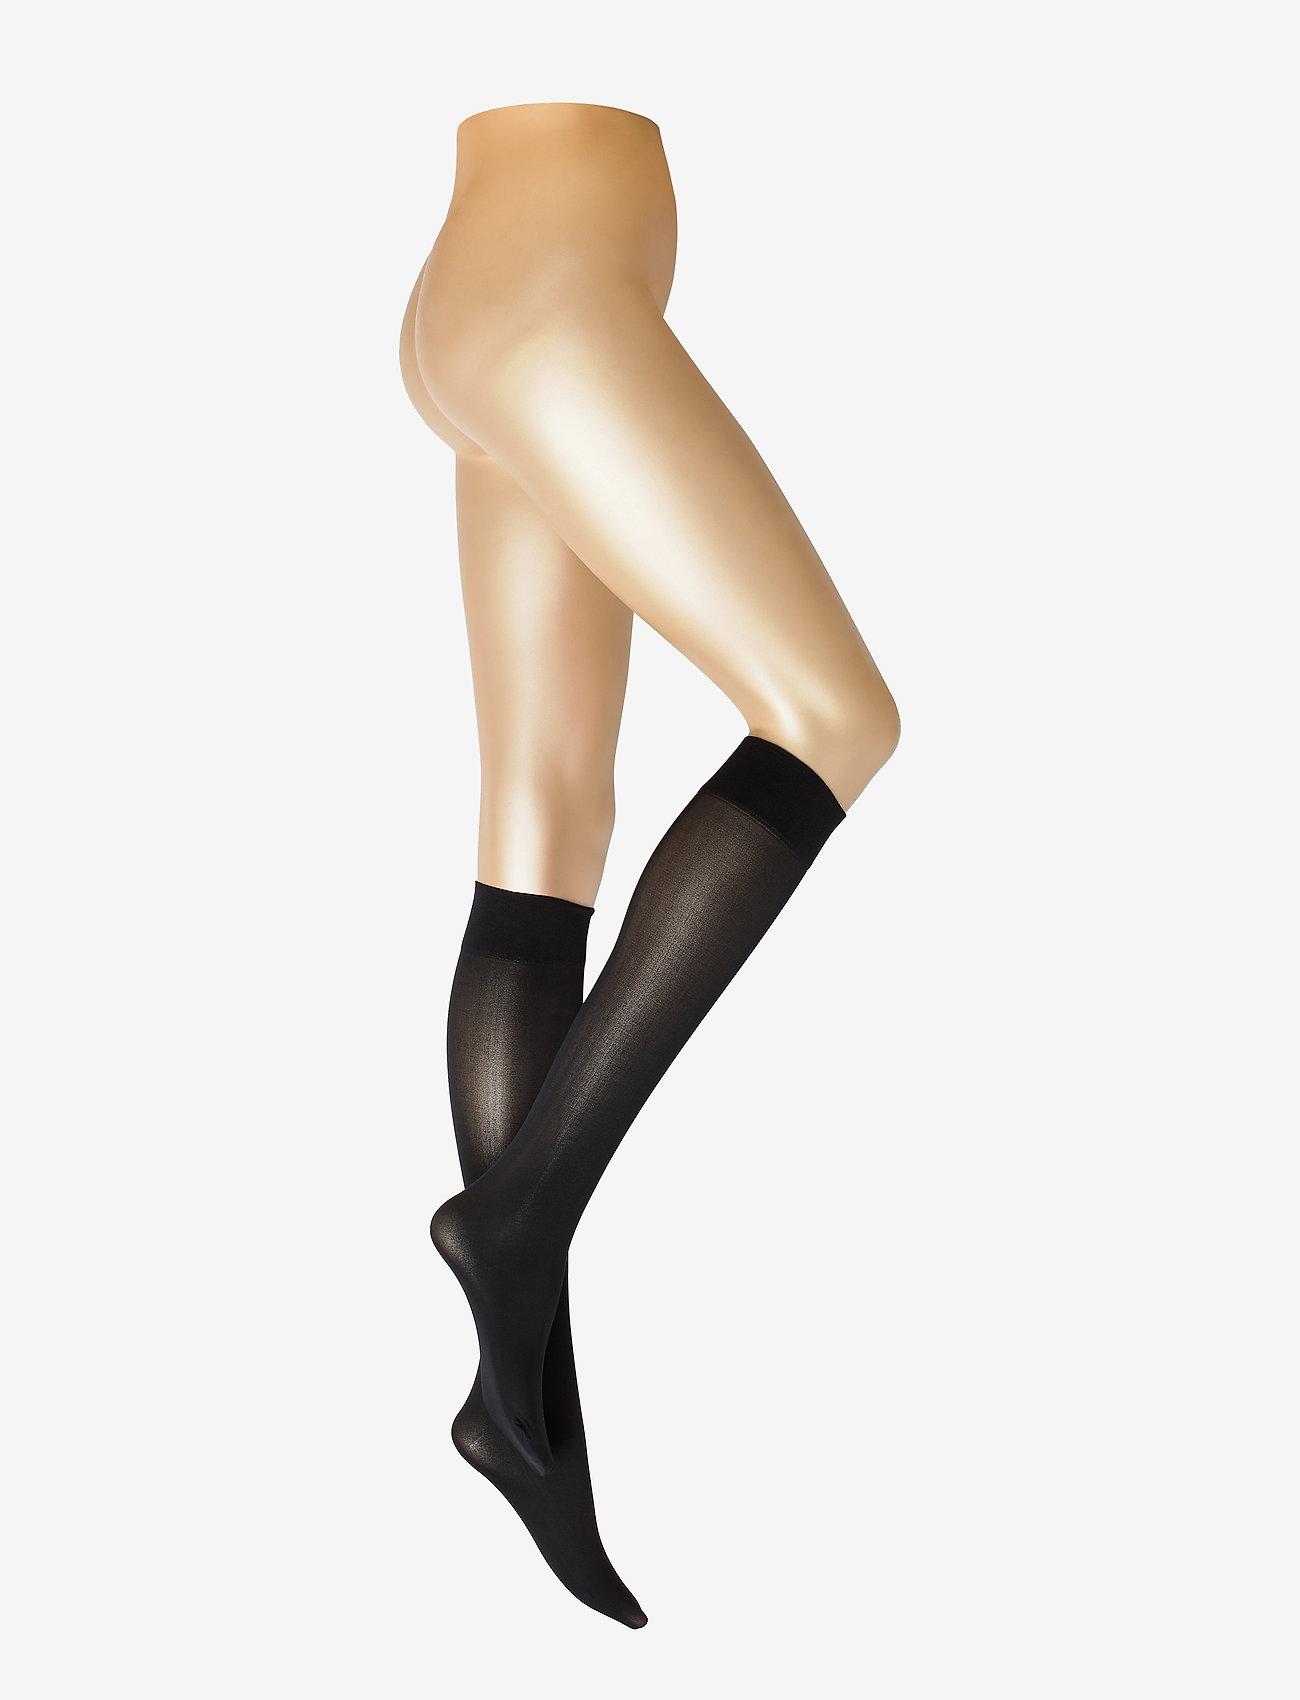 Decoy - DECOY knee high microfiber 60 - chaussettes hautes - svart - 0